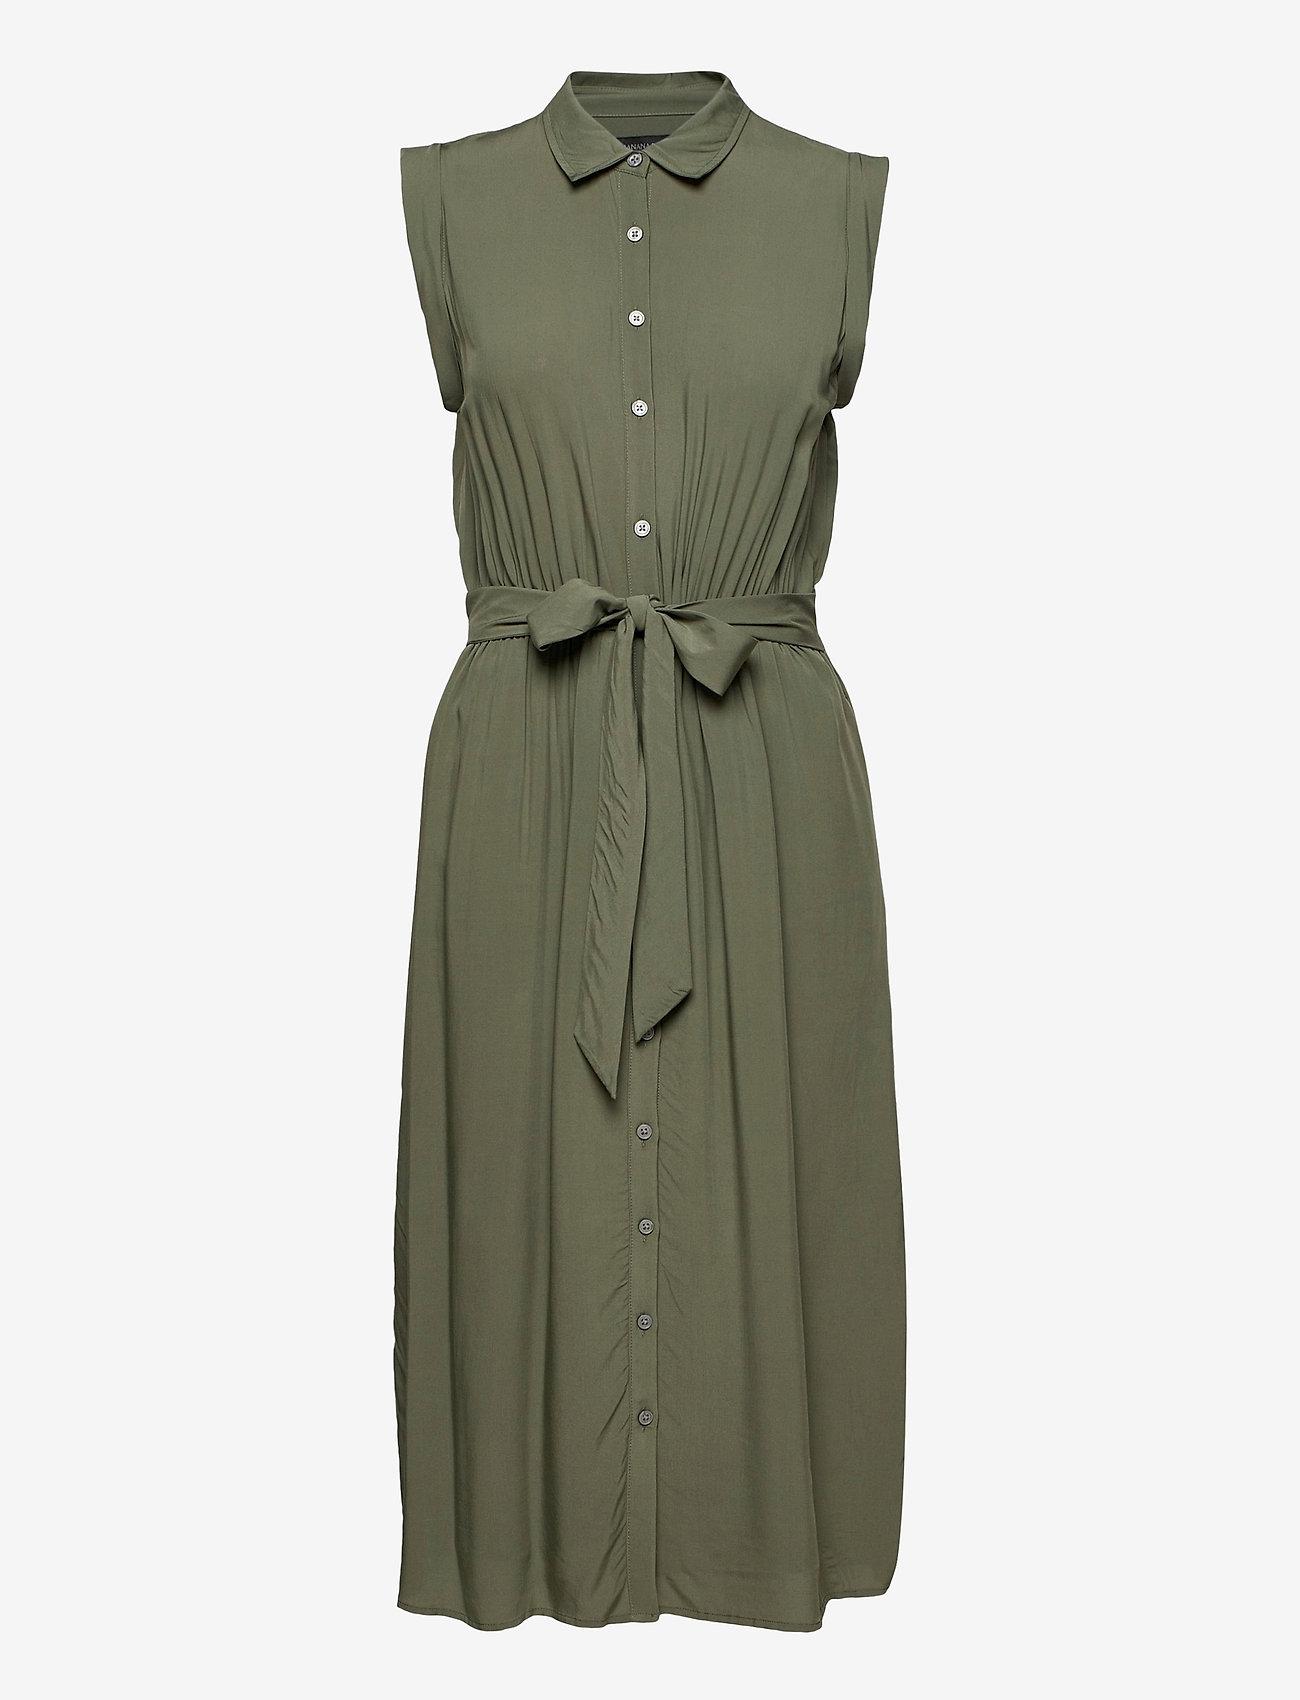 Banana Republic - LENZING™ ECOVERO™ Shirtdress - summer dresses - flight jacket - 0